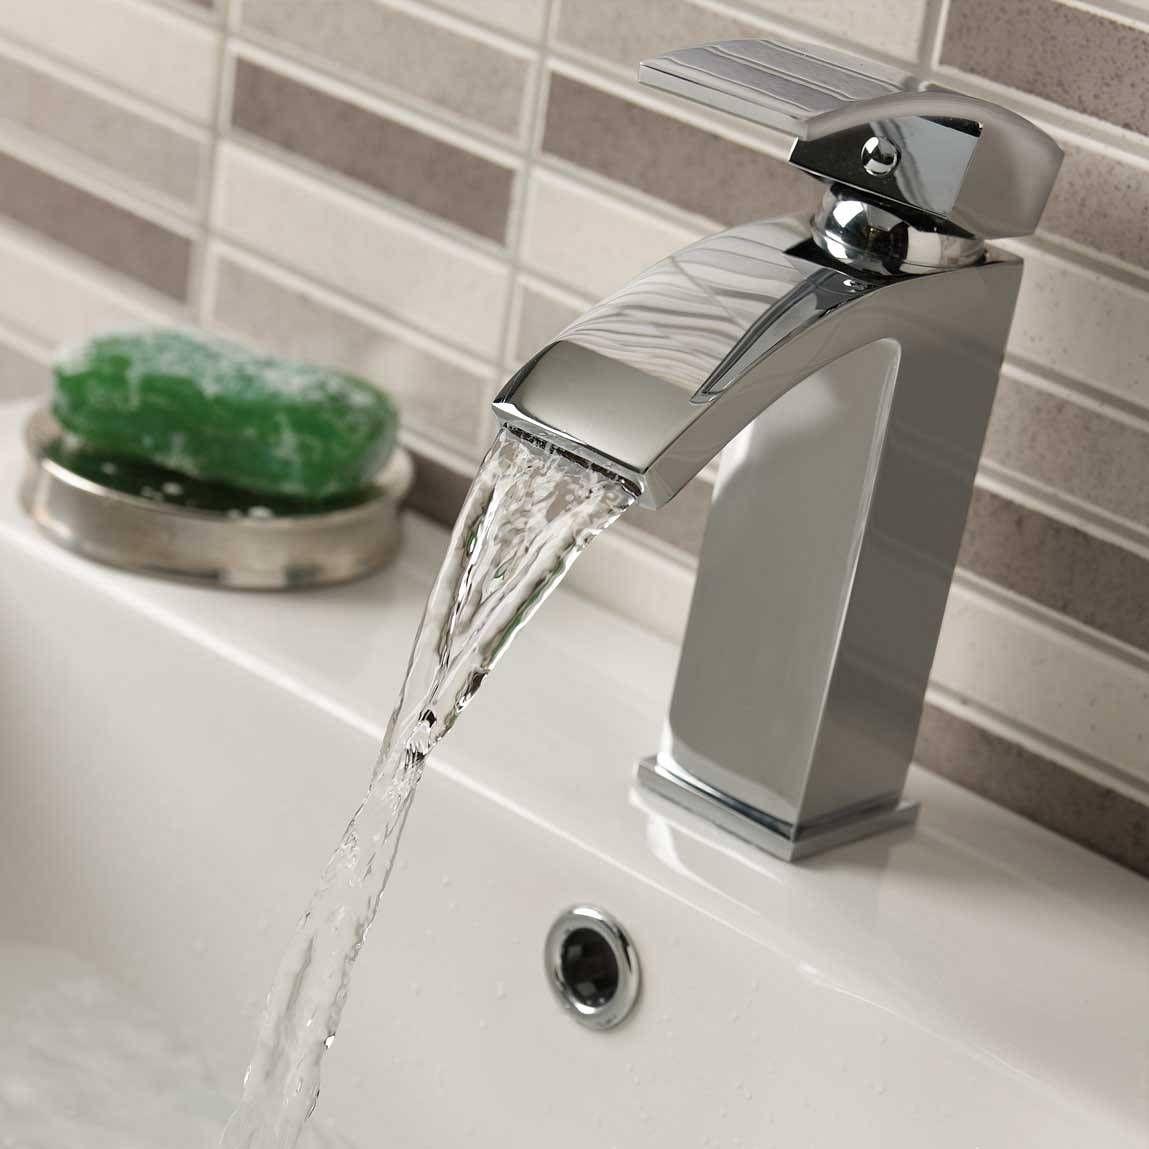 Century Basin Mixer Victoria Plumb Mixer Basin Tap With Images Bath Shower Mixer Bath Shower Mixer Taps Shower Mixer Taps